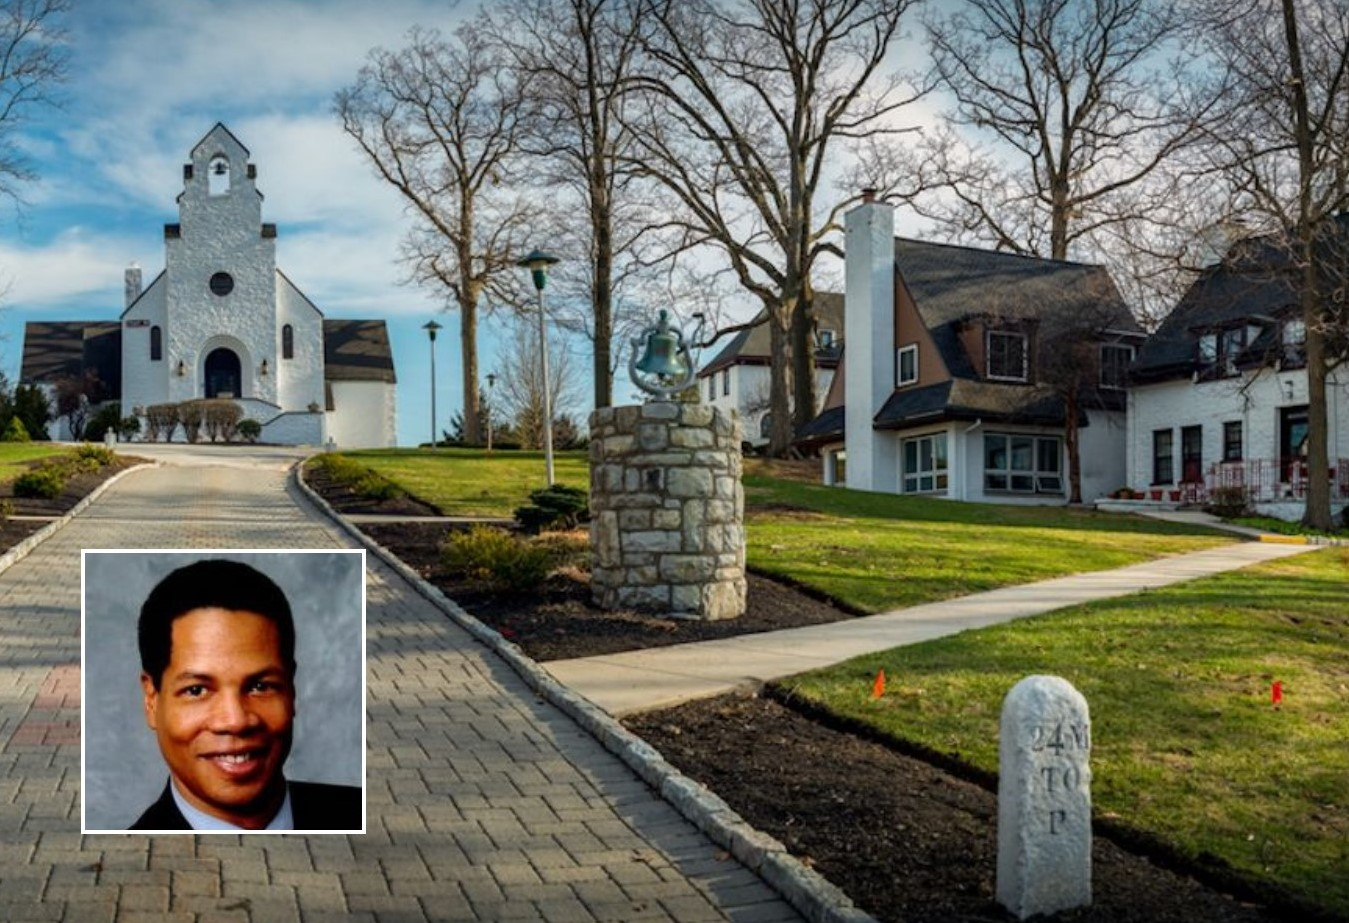 Church Farm School Welcomes Philadelphia Pastor, Media Analyst as Convocation Speaker